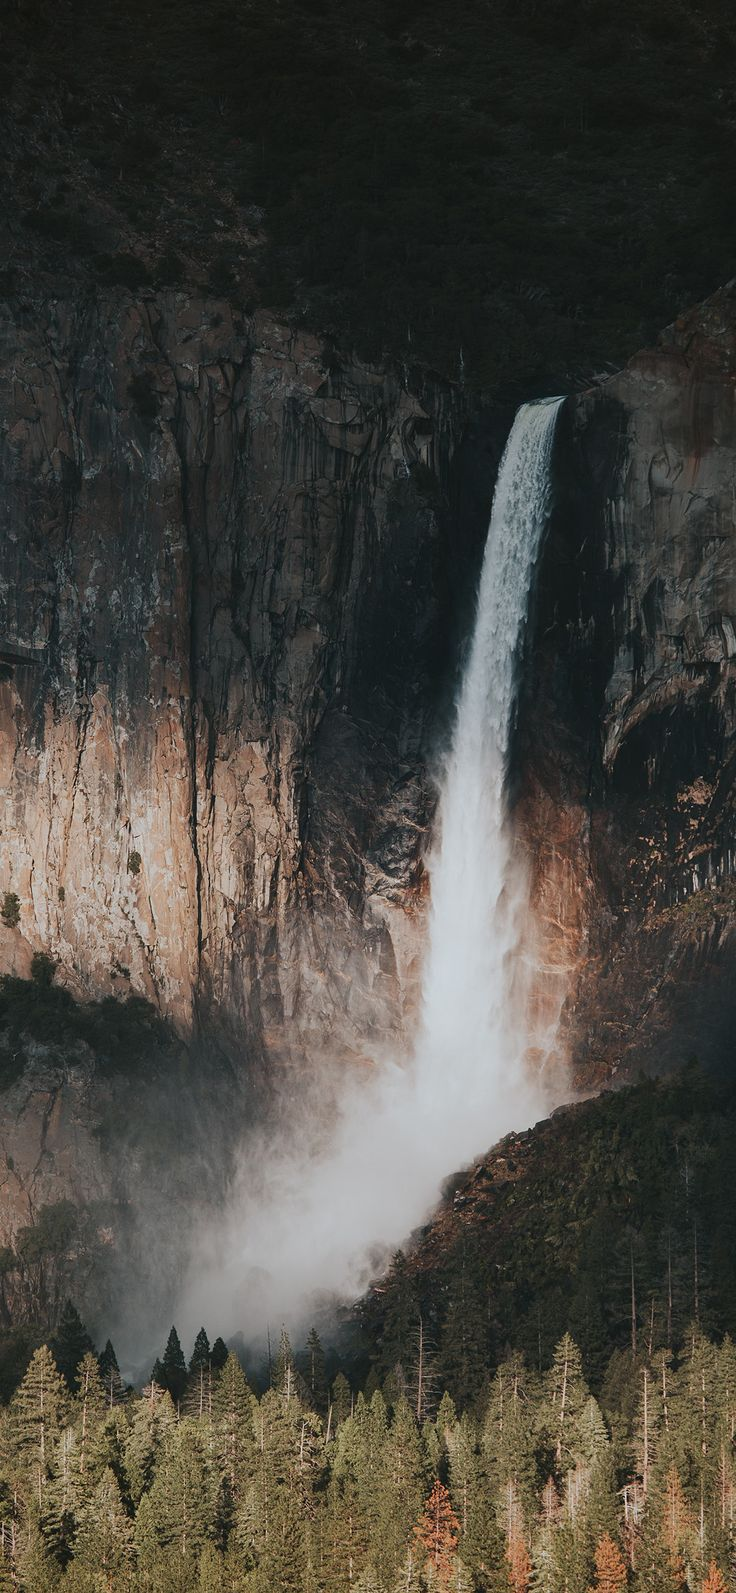 Iphone X Wallpaper Nz22 Water Fall Mountain Nature Via